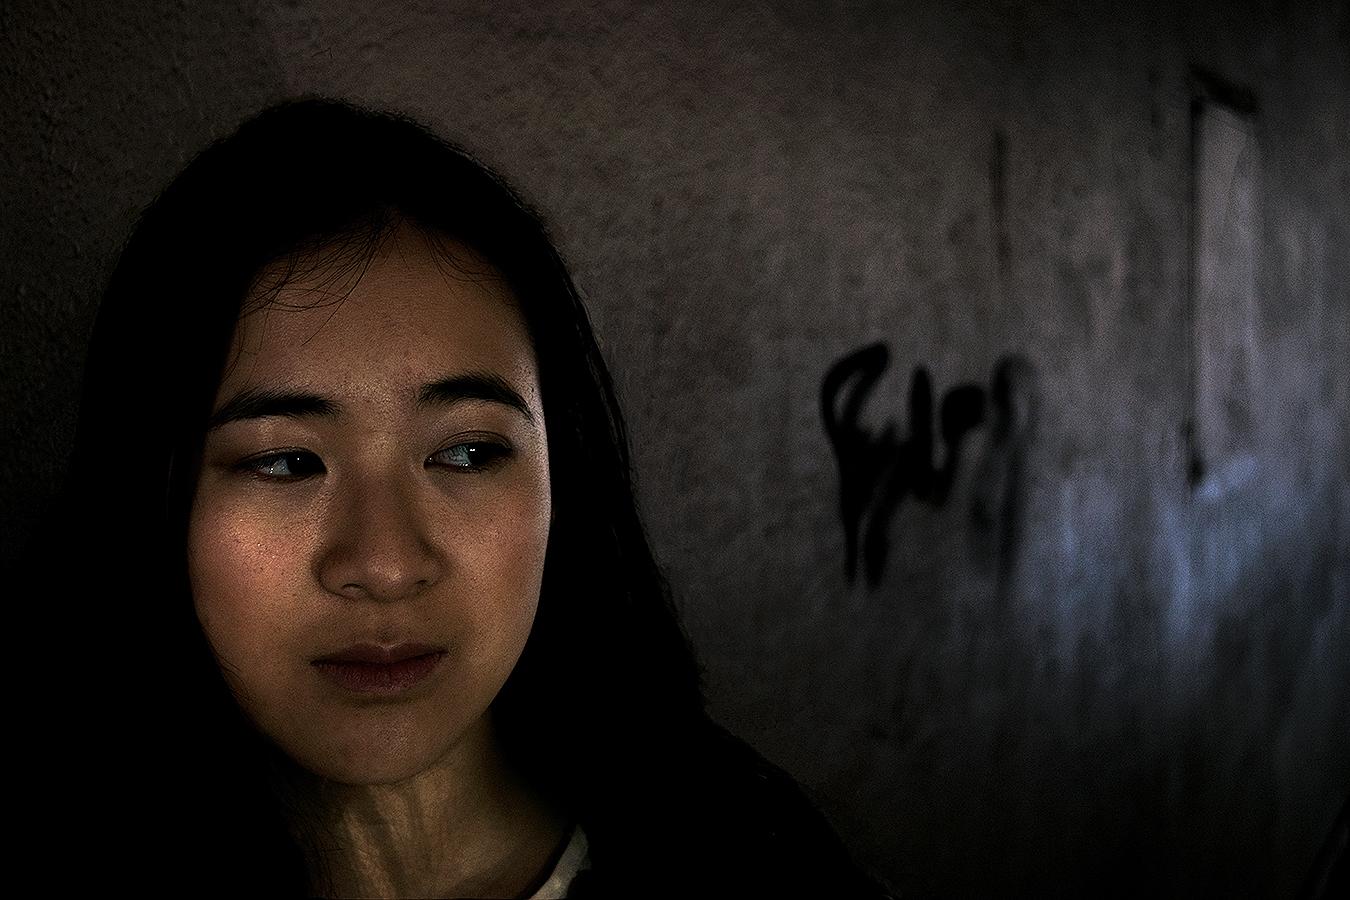 Alexander_Liu_photography_Kathryn_Wang_sad_despair_alley_graffiti_moody_Philadelphia_Upenn_emotions